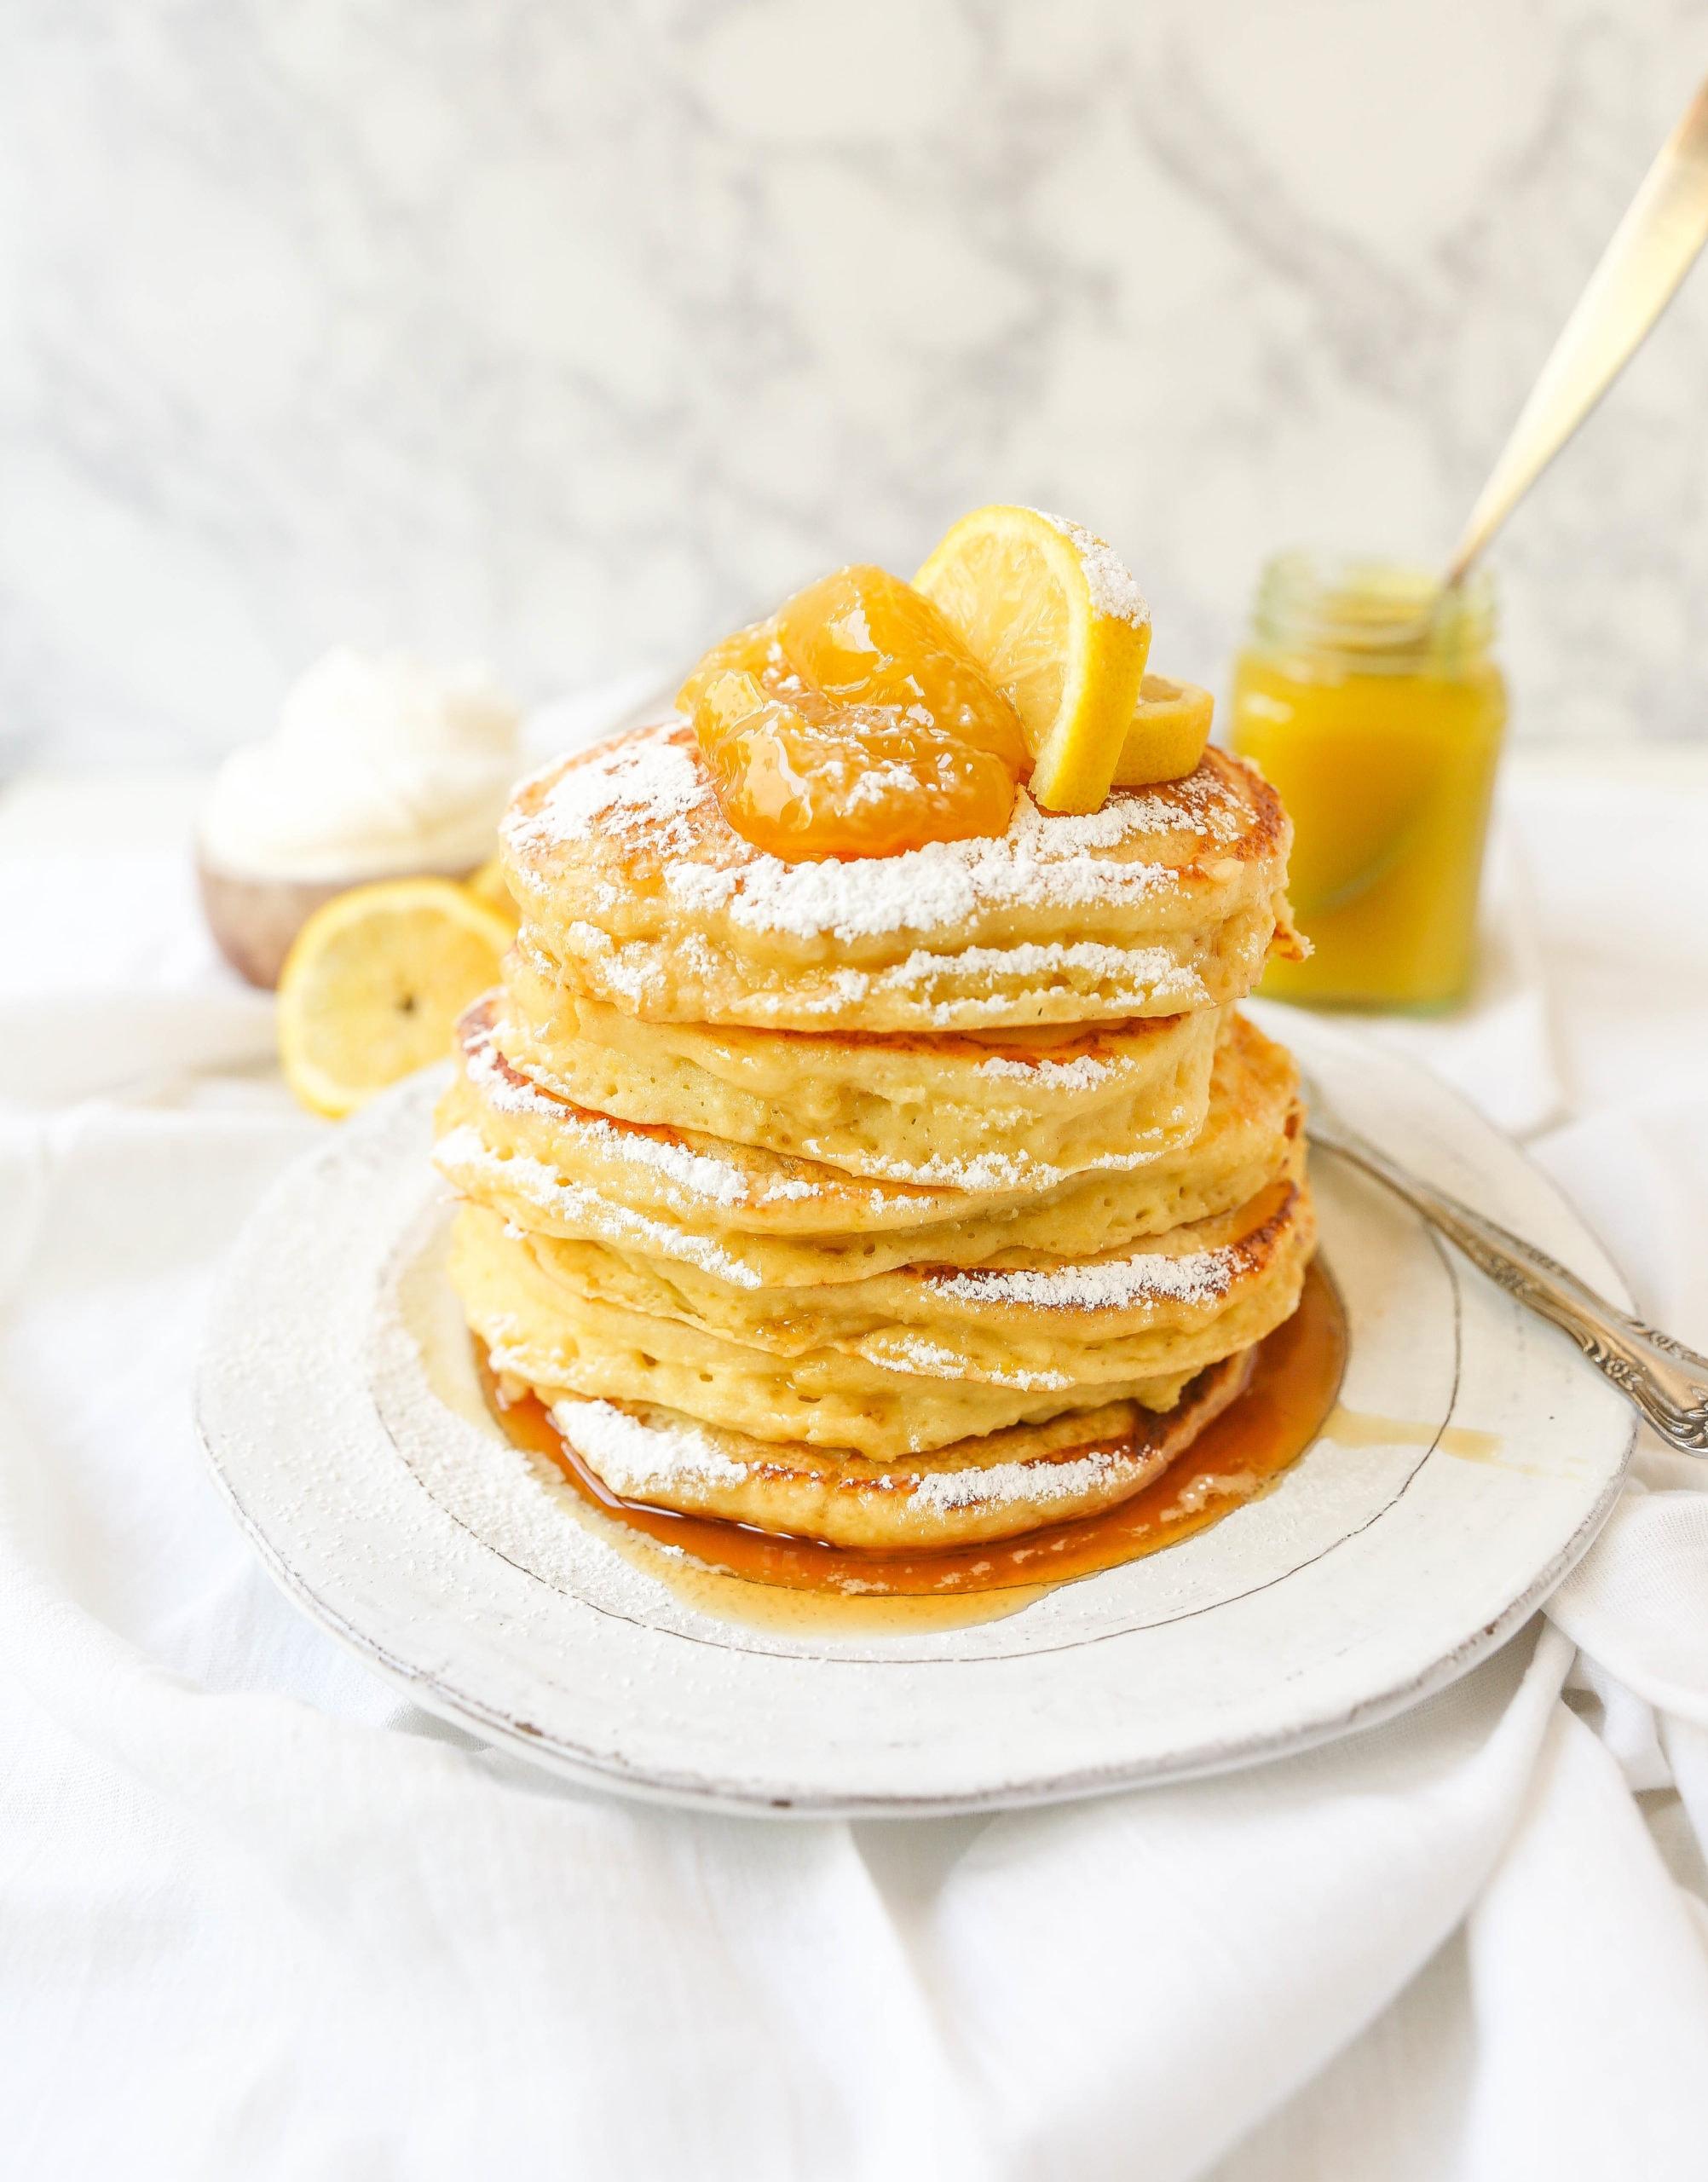 Lemon Ricotta Pancakes Creamy, fluffy lemon ricotta pancakes made with fresh ricotta, buttermilk, fresh lemon zest, and juice. A mix between a pancake and a crepe with a melt-in-your-mouth soft texture.www.modernhoney.com #pancakes #lemonricottapancakes #brunch #breakfast